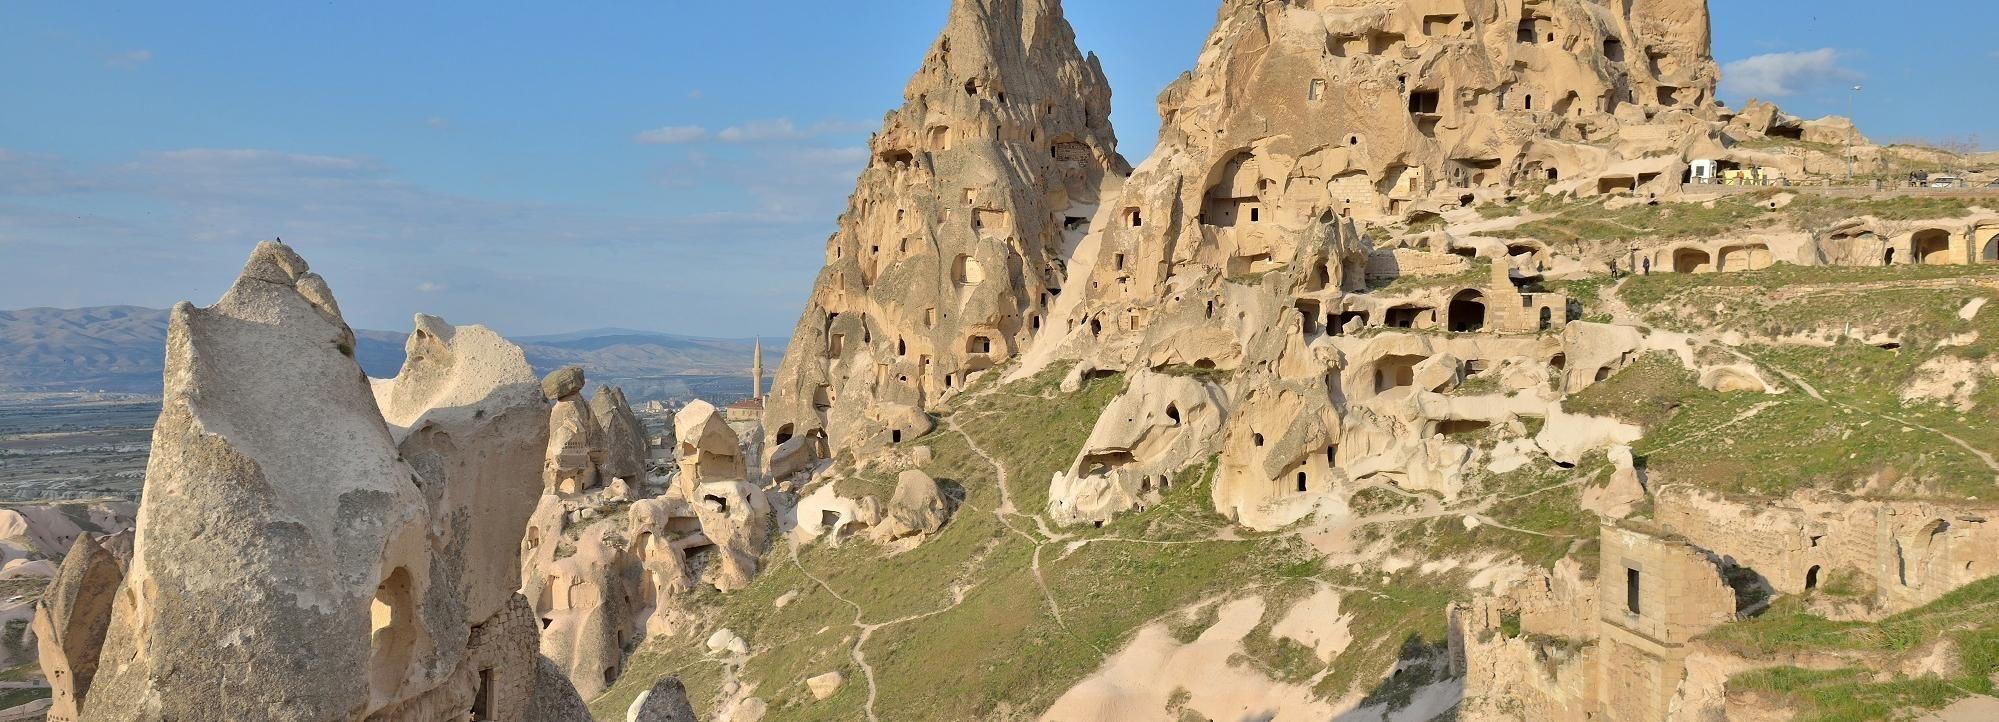 Cappadocia: 2 Day Tour from Kayseri